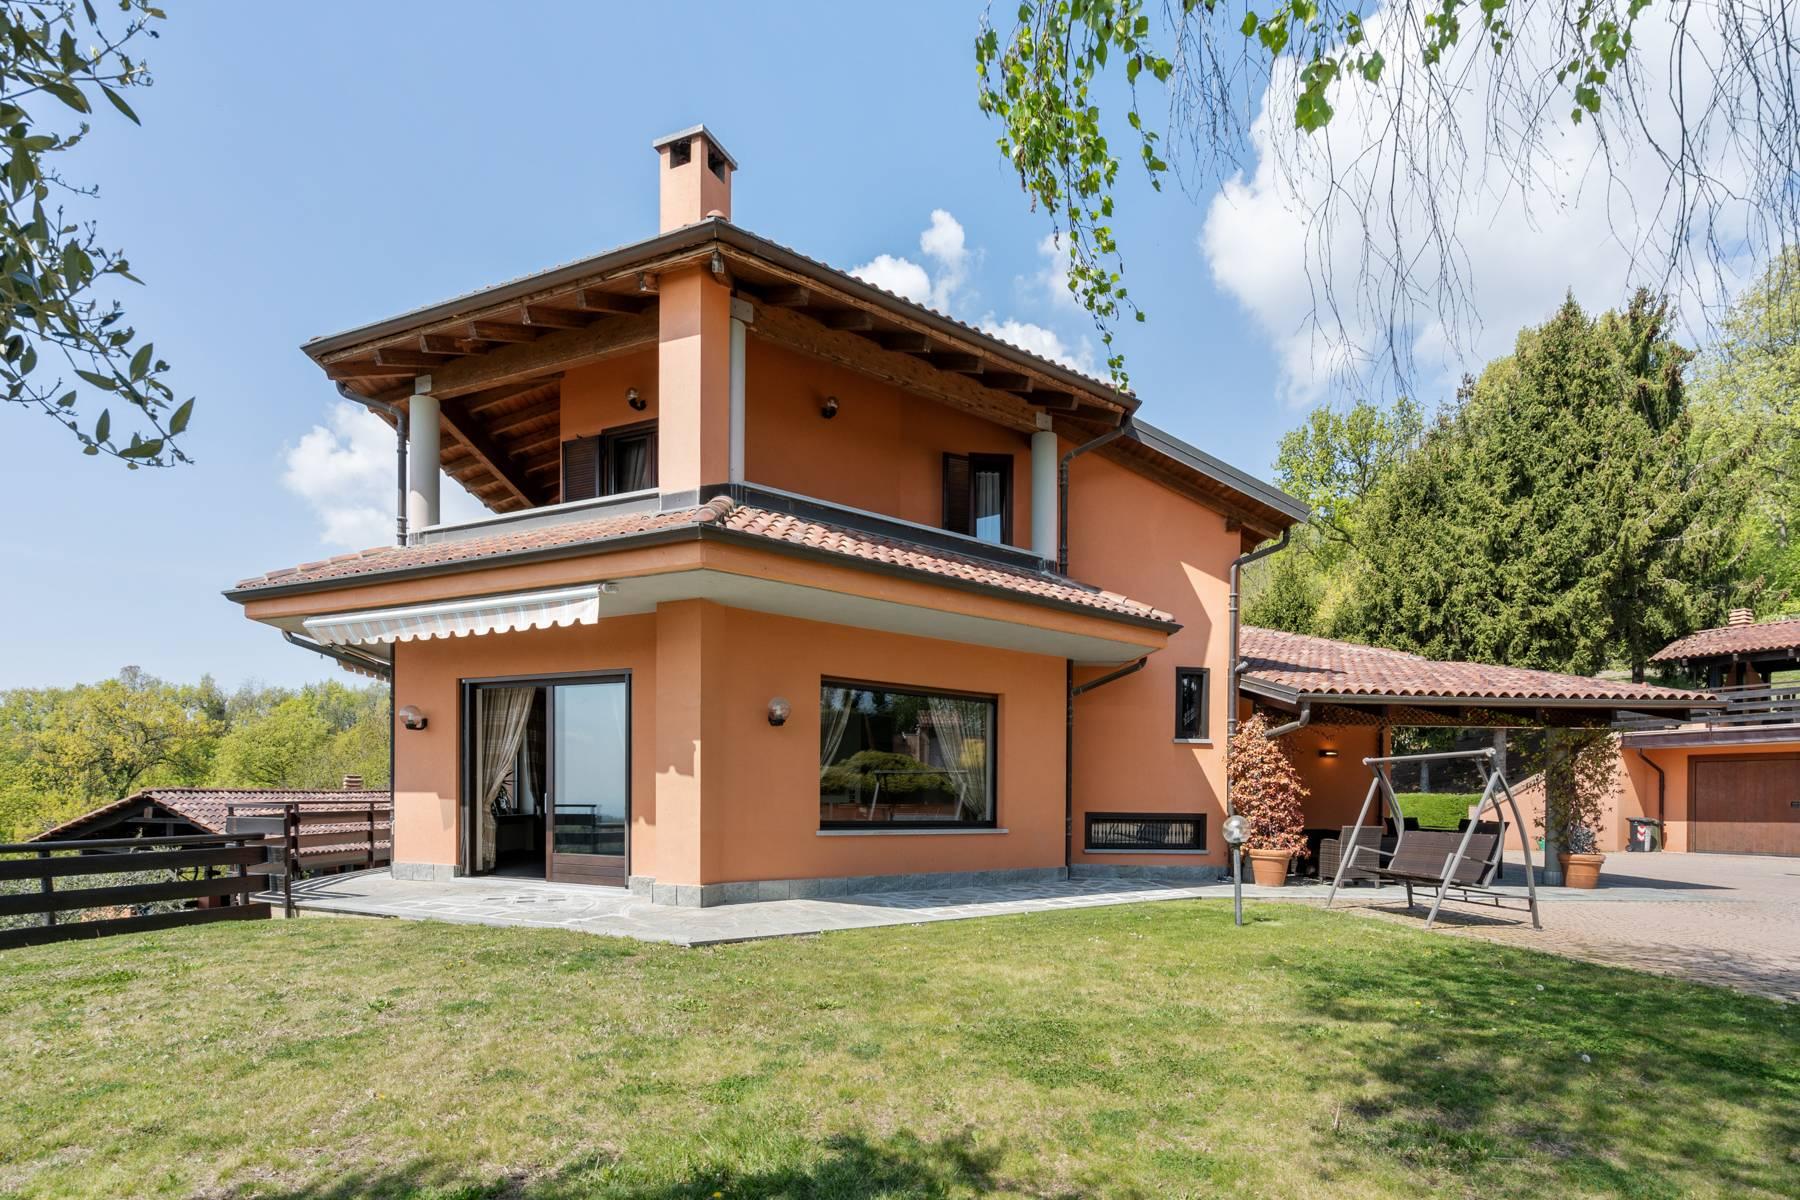 Villa in Vendita a Baldissero Torinese: 5 locali, 503 mq - Foto 1